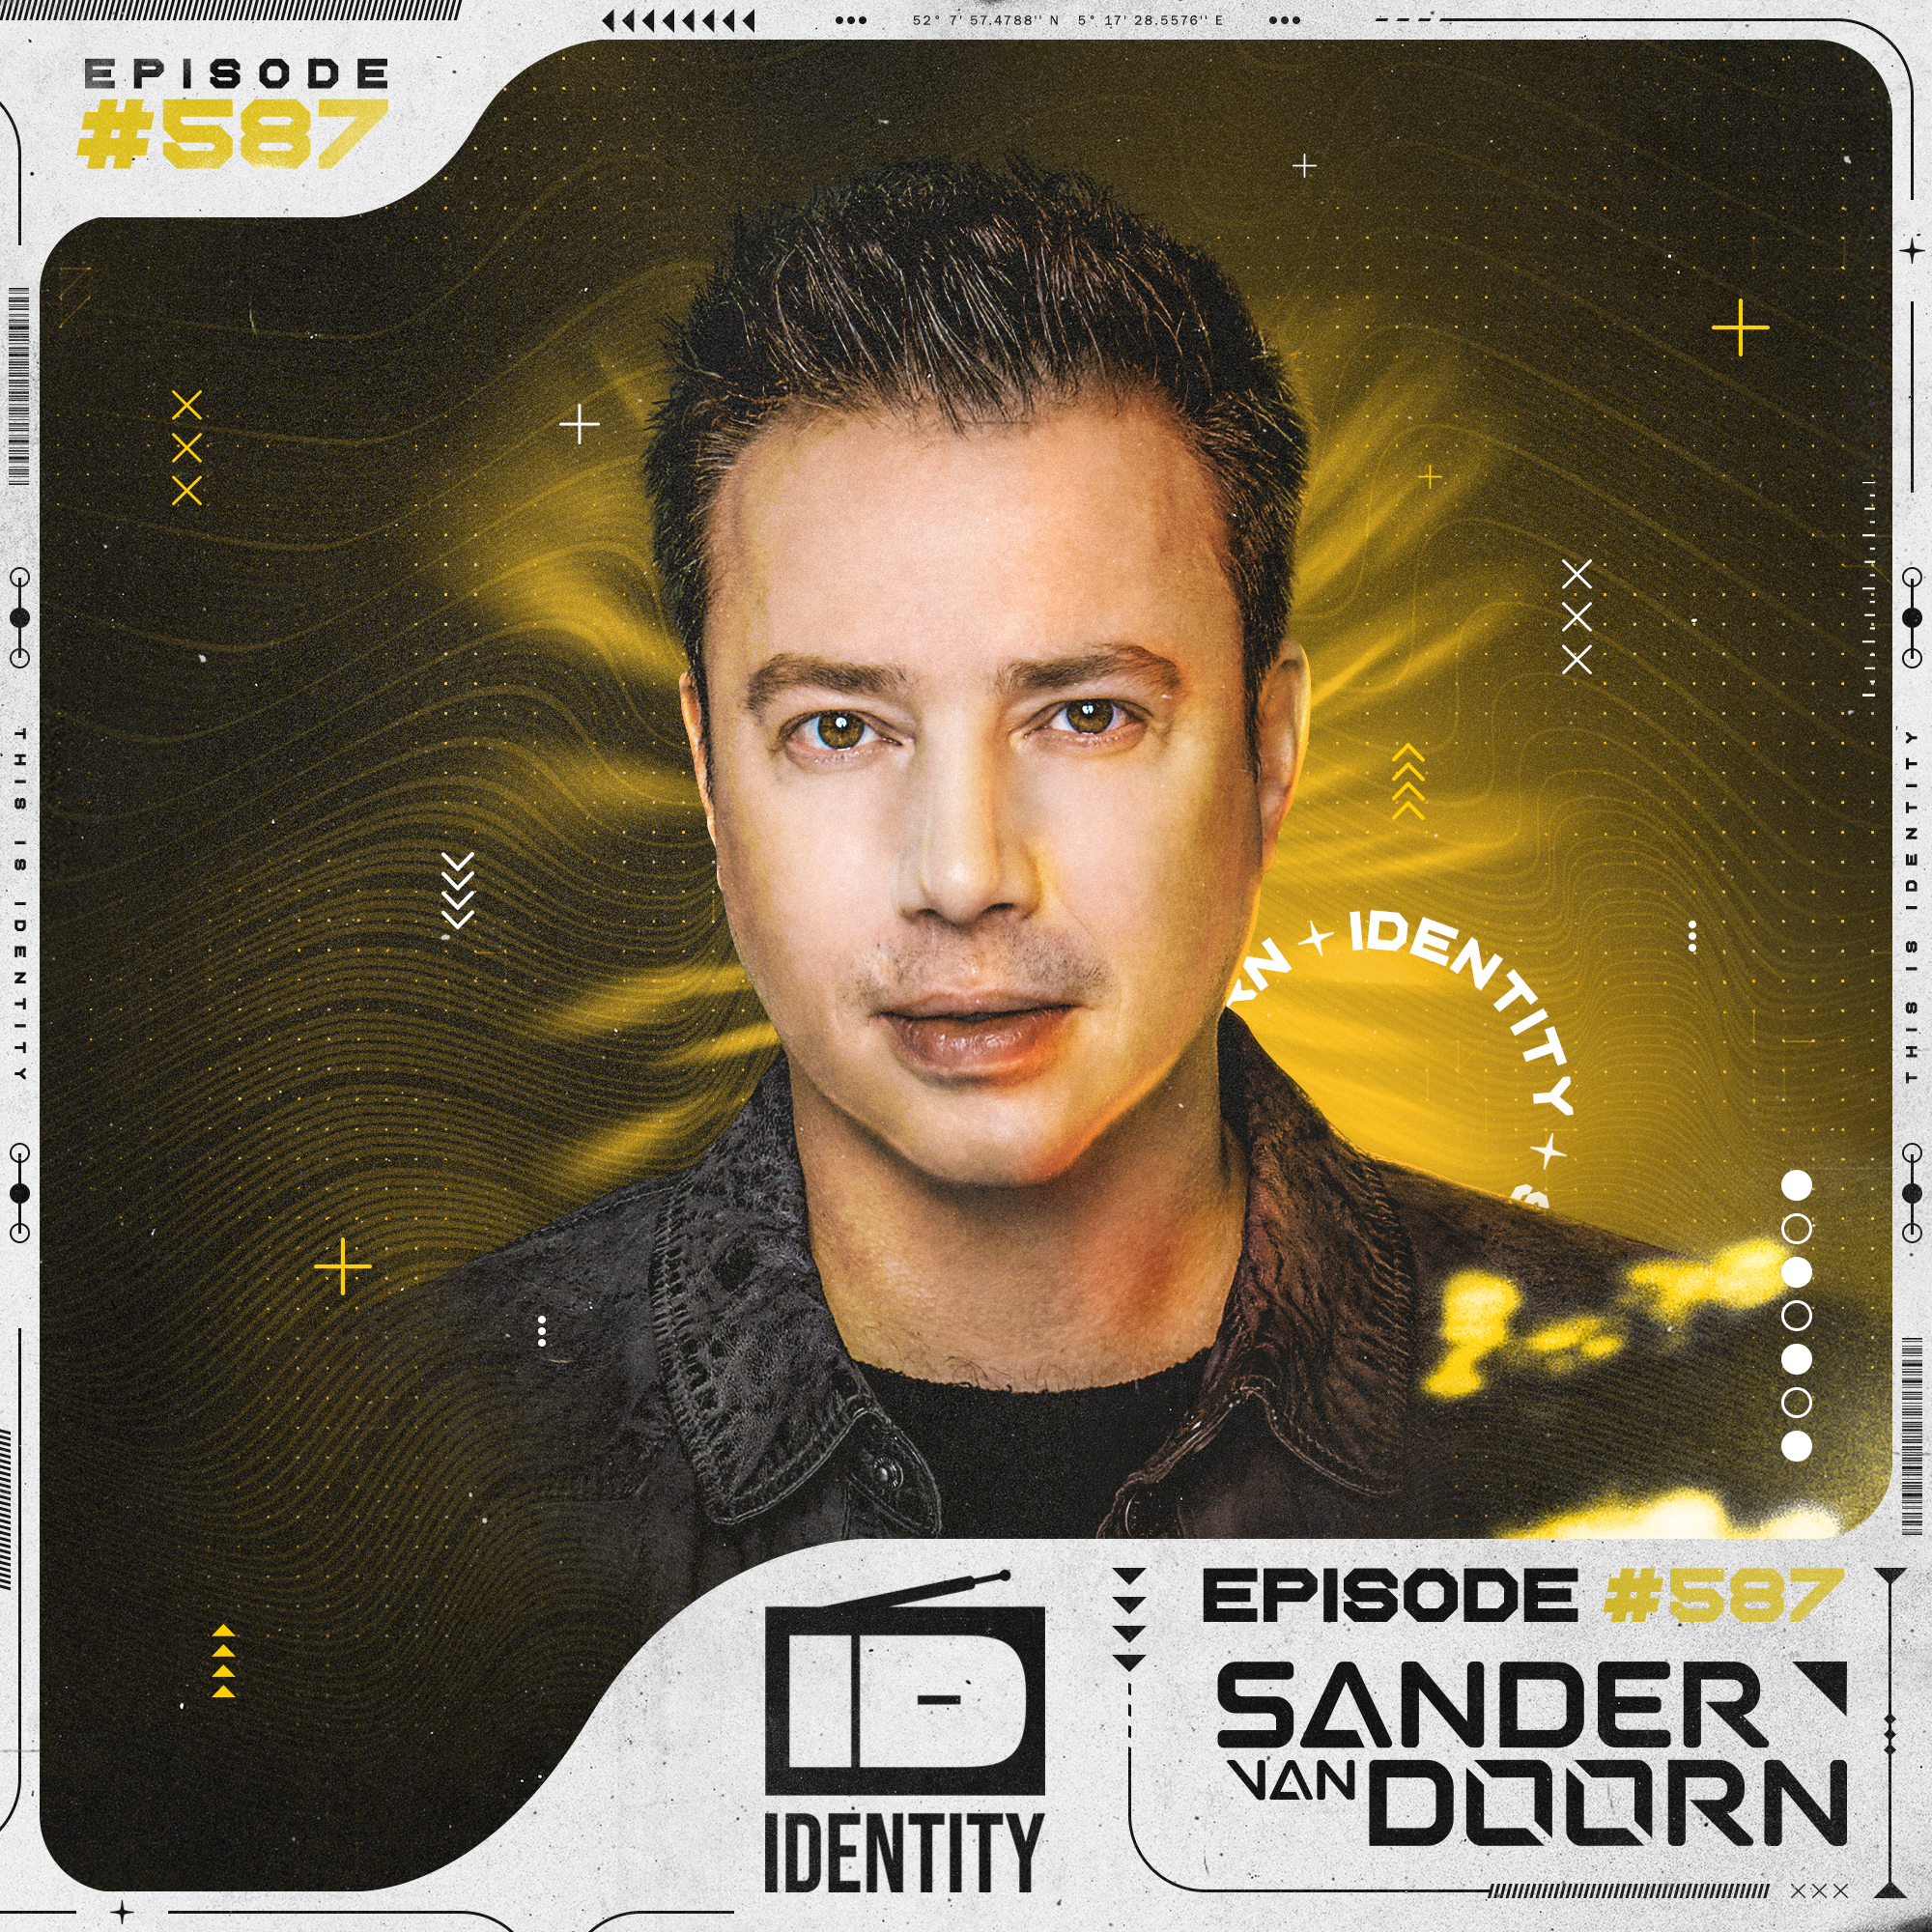 Identity 587